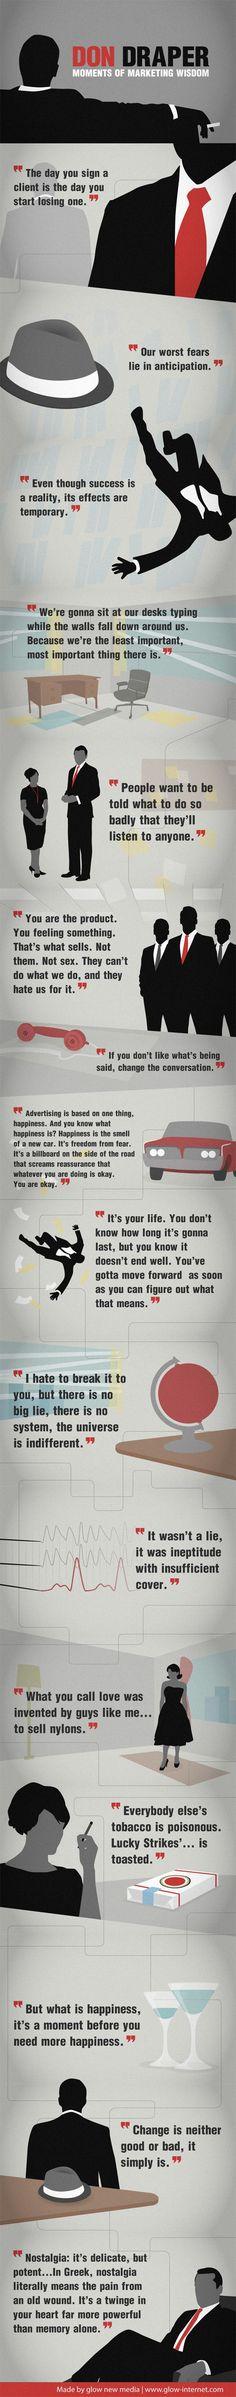 Don Draper Moments of Marketing Wisdom #dondraper by way of #Slate.com